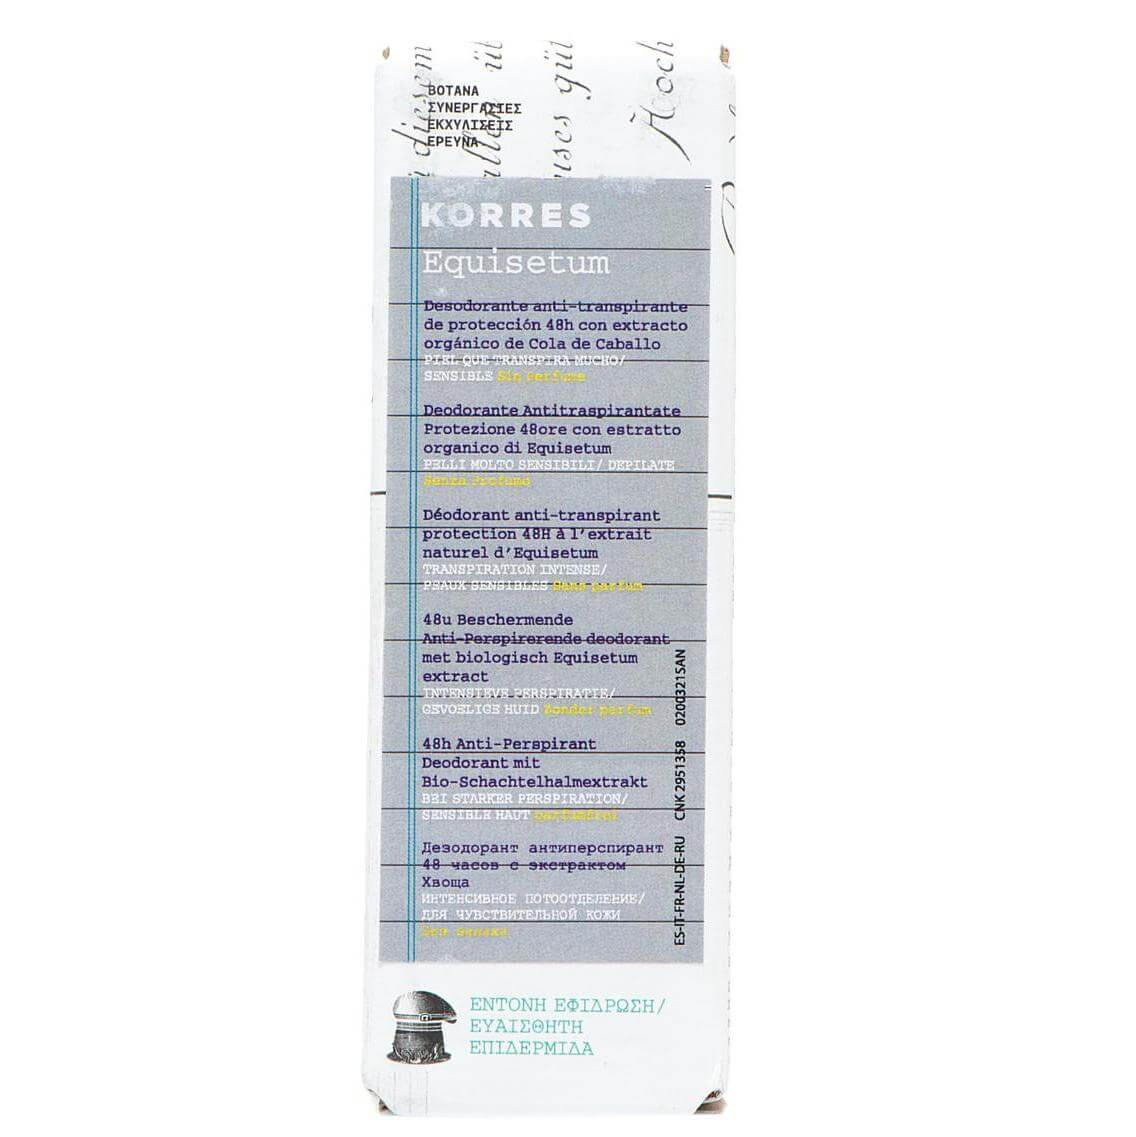 Korres Αποσμητικό Αντιιδρωτικό Χωρίς Άρωμα 48ωρης Προστασίας με Βιολογικό Εκχύλισμα Equisetum για Έντονη Εφίδρωση 30ml